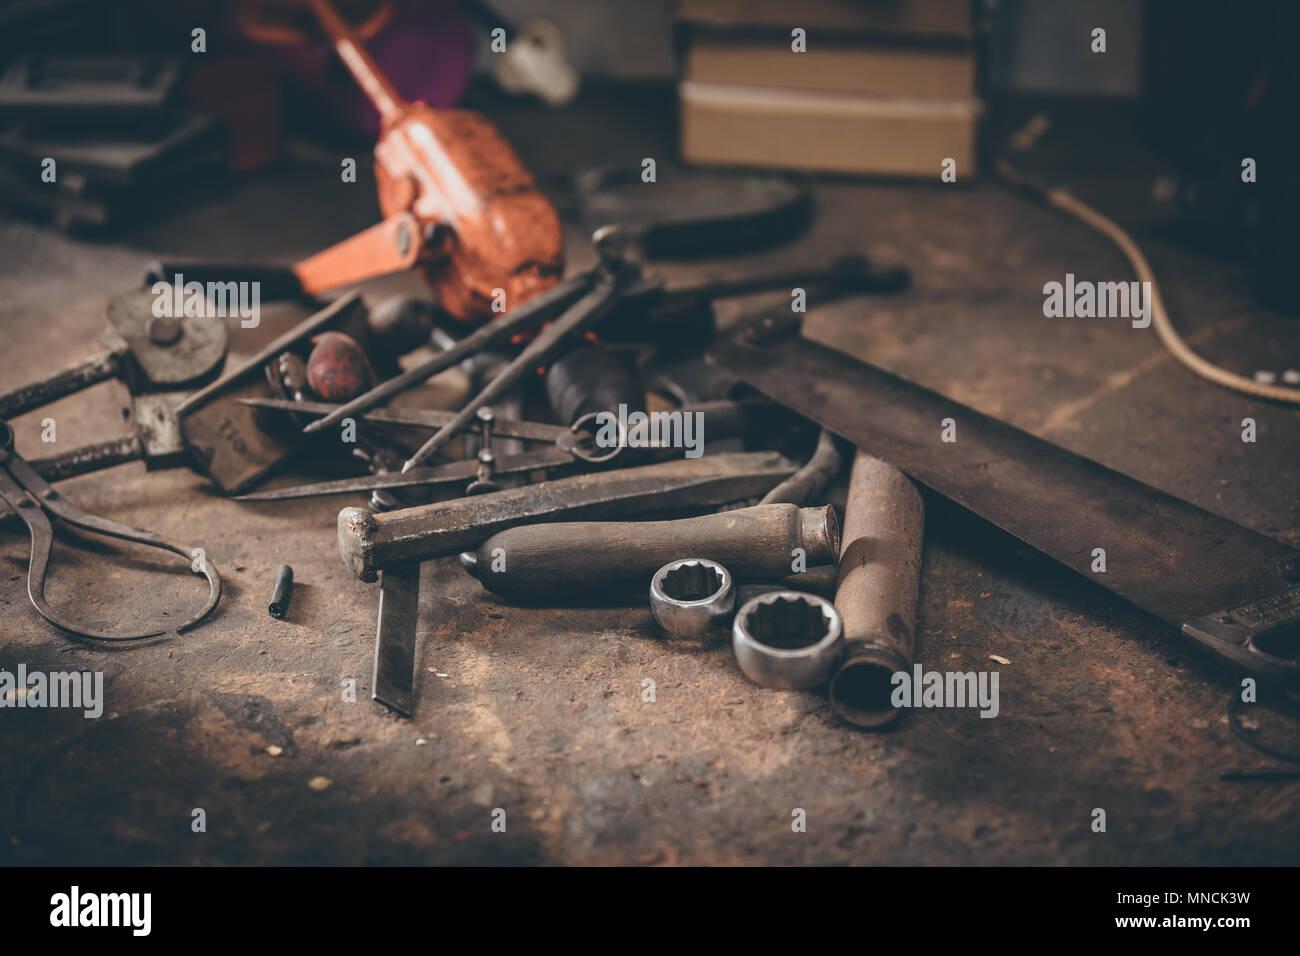 Workbench Tools Stockfotos & Workbench Tools Bilder - Seite 2 - Alamy